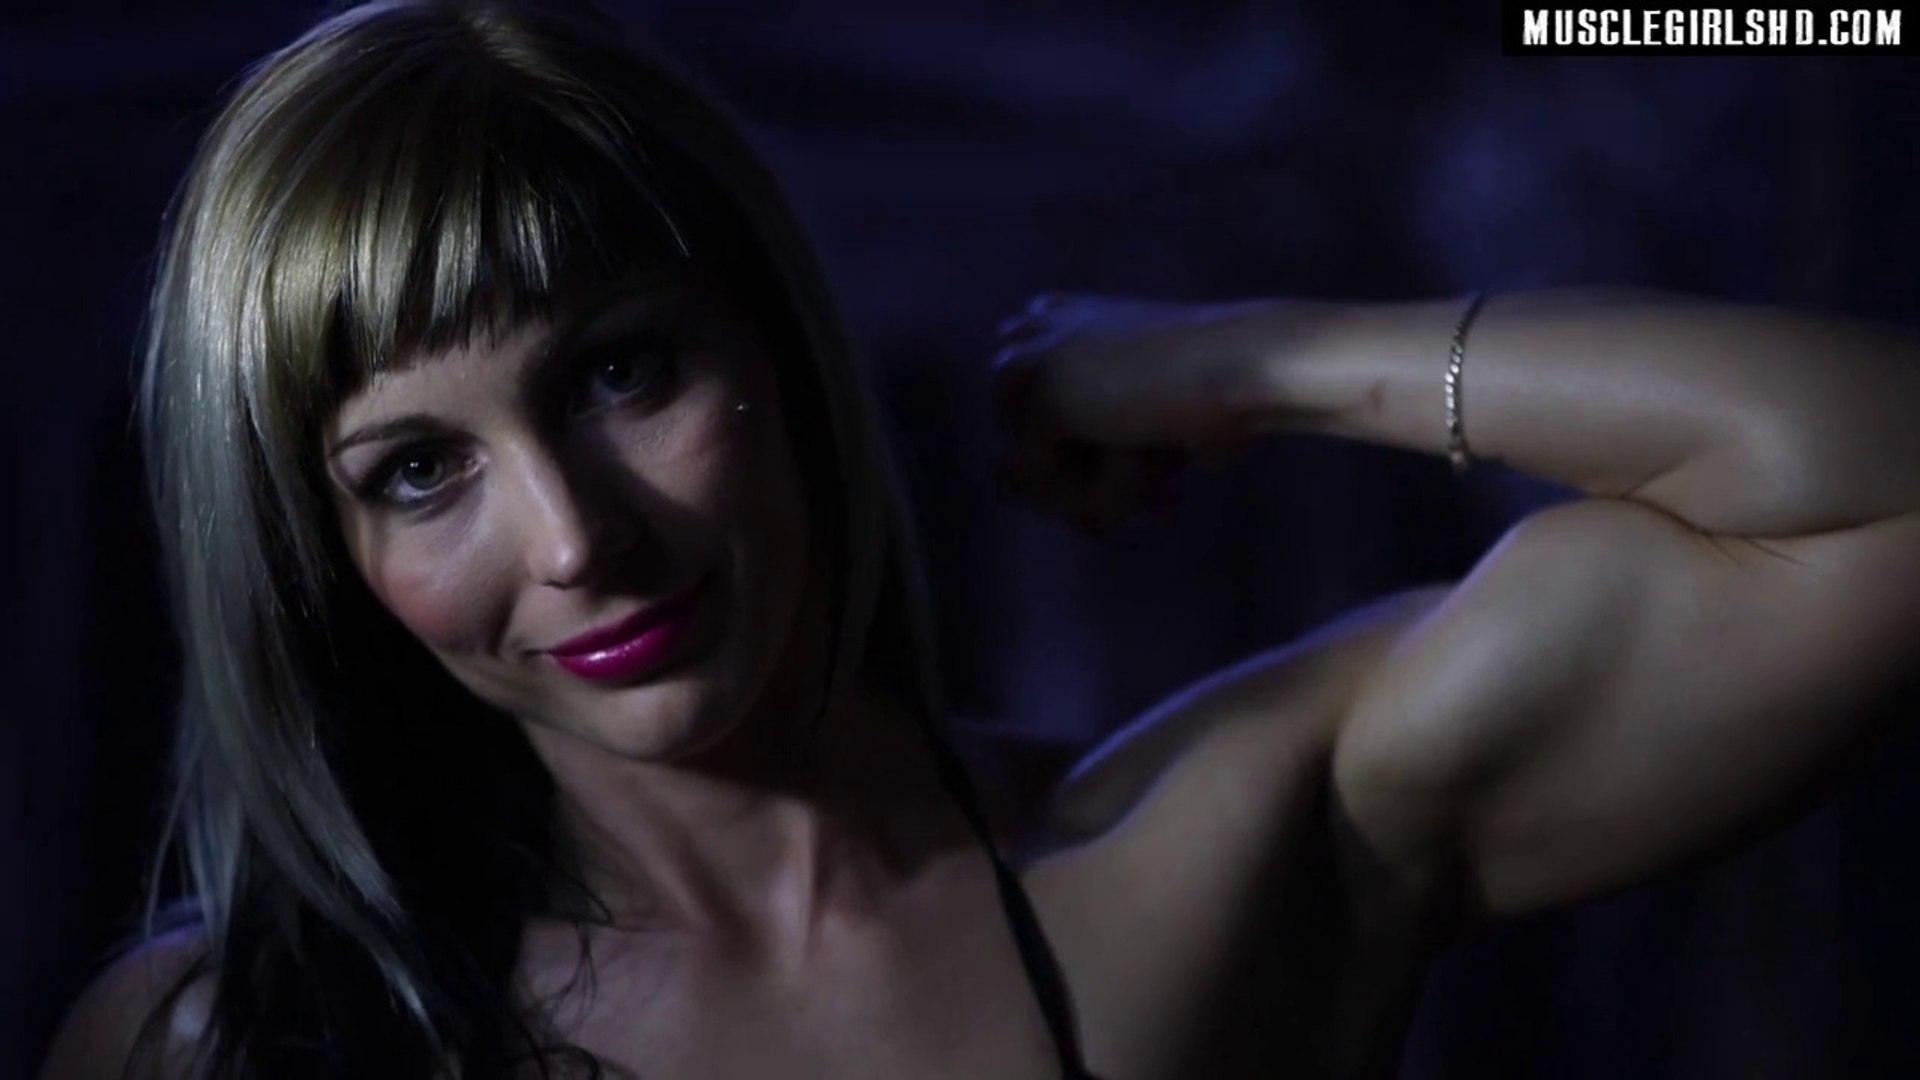 Young Female Bodybuilder Flexing Biceps